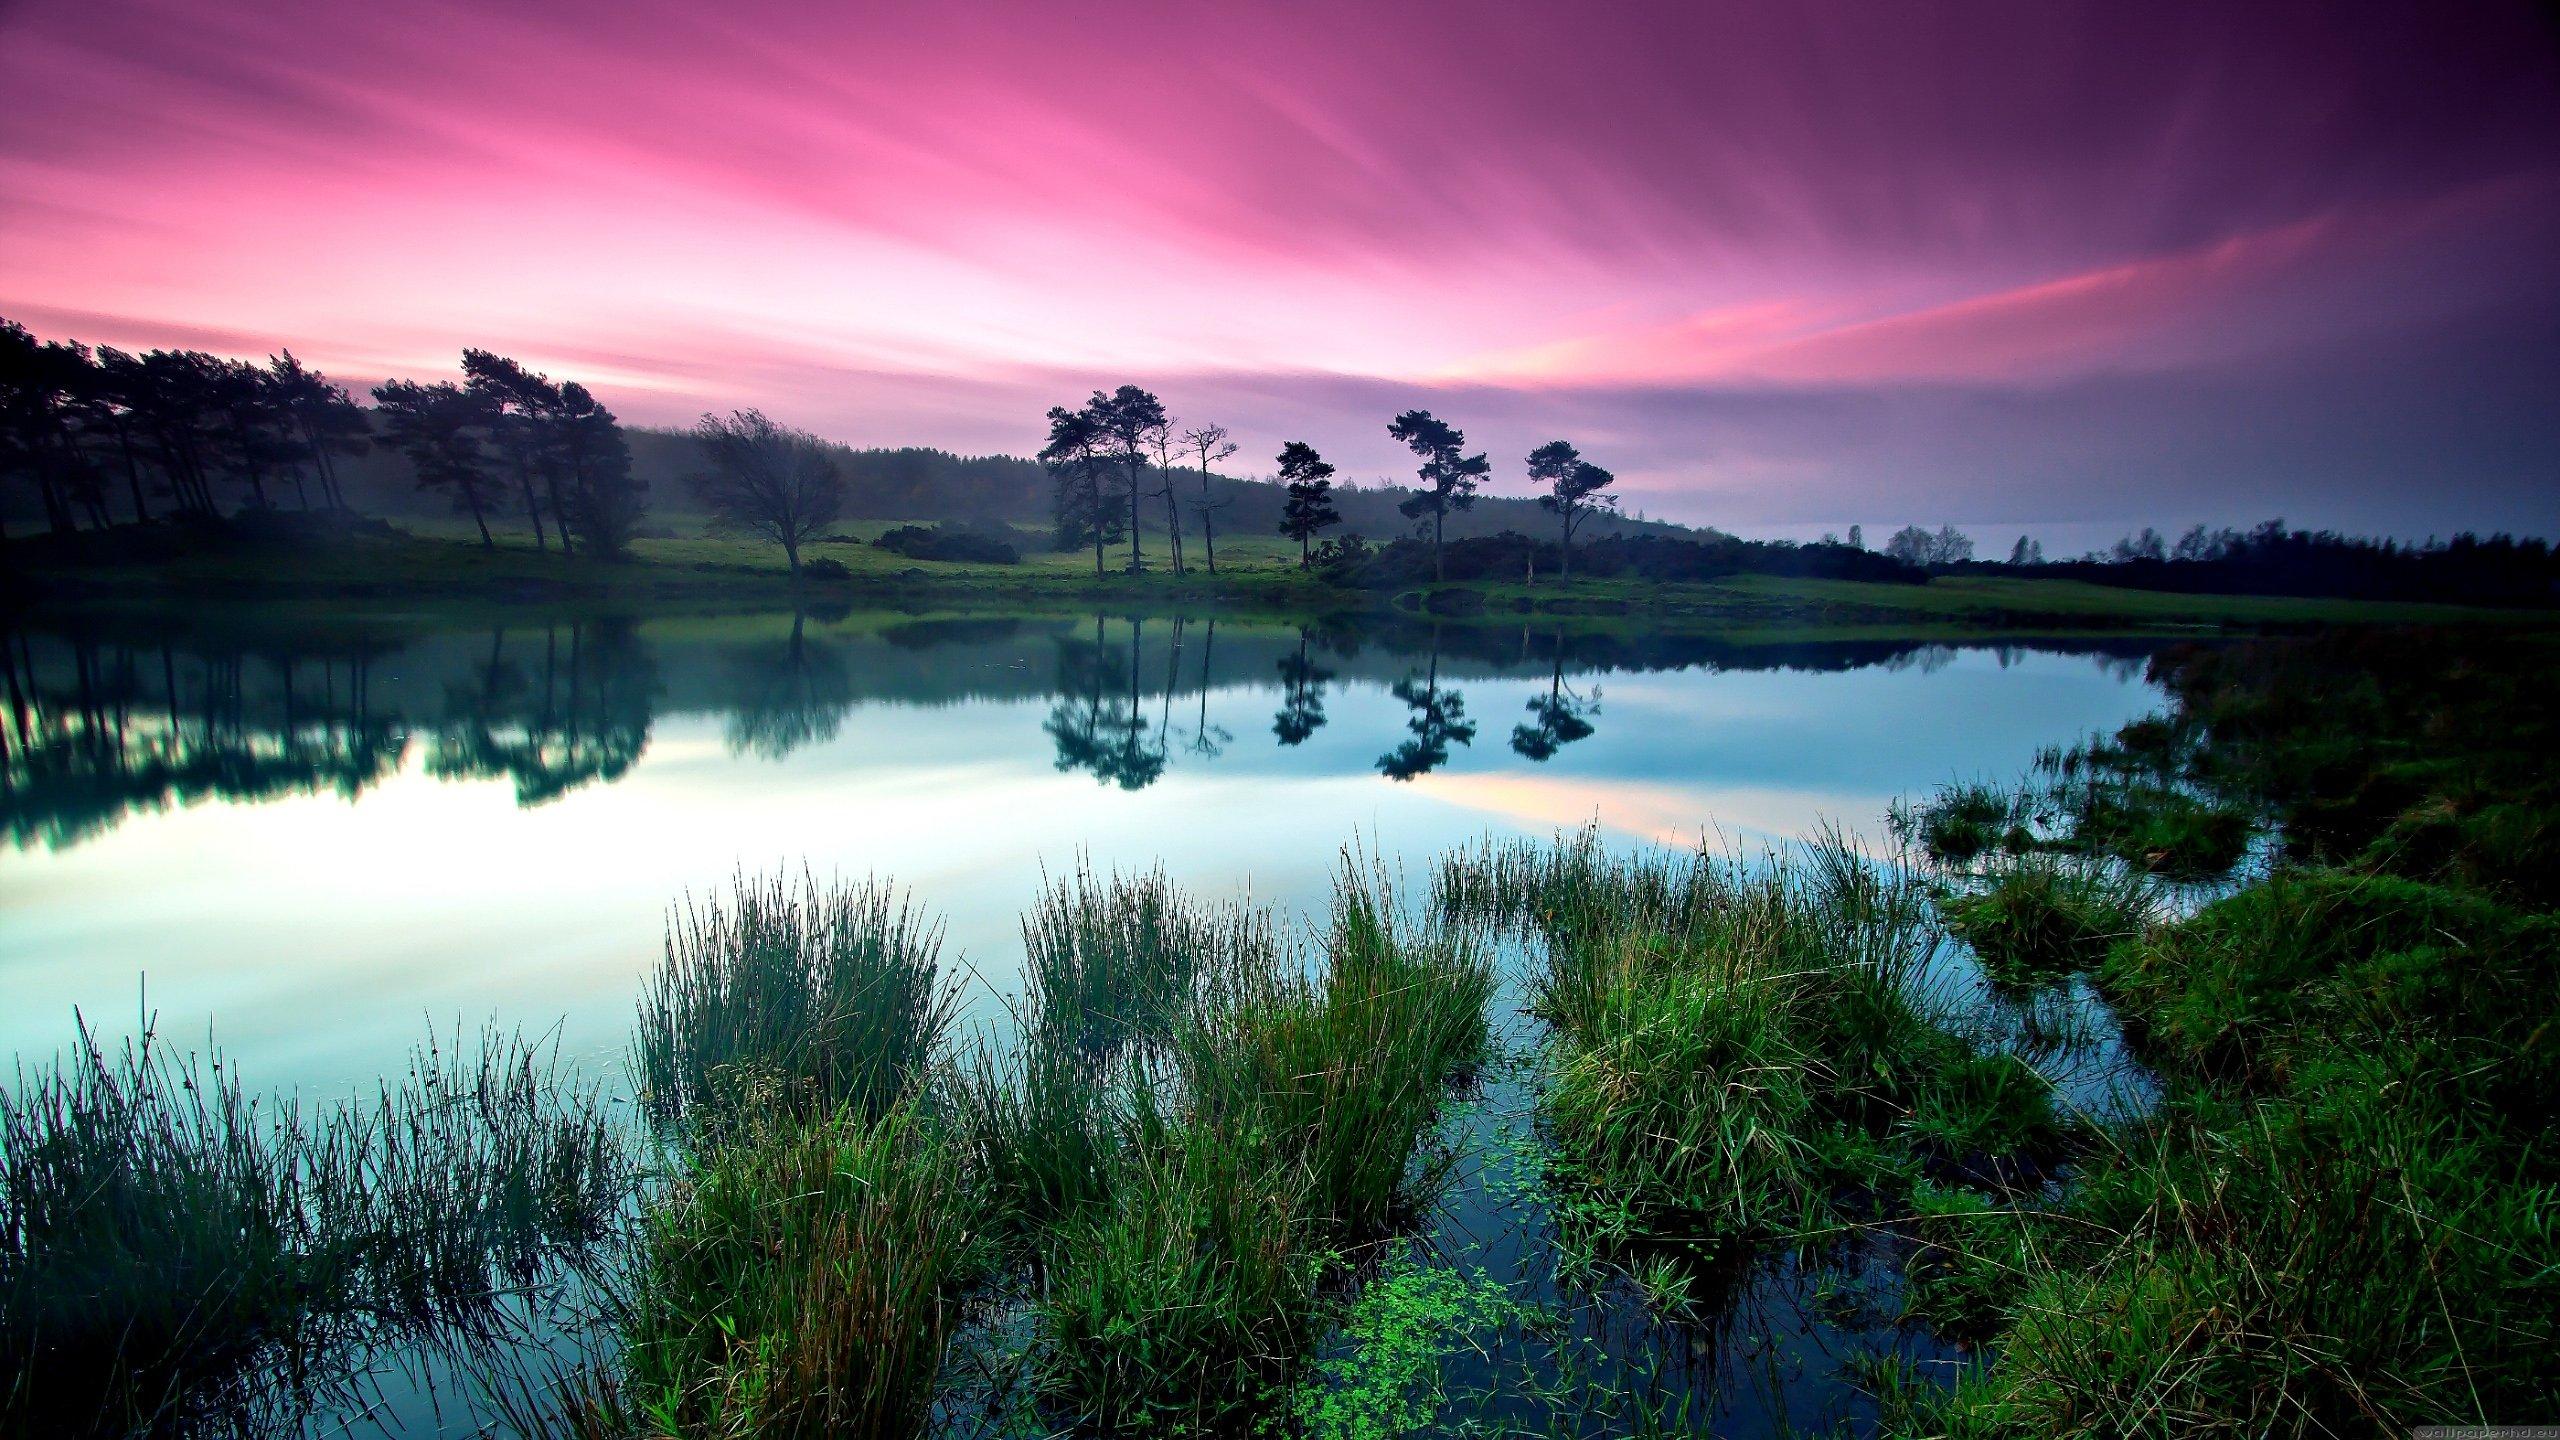 Peaceful Nature 871234 - WallDevil